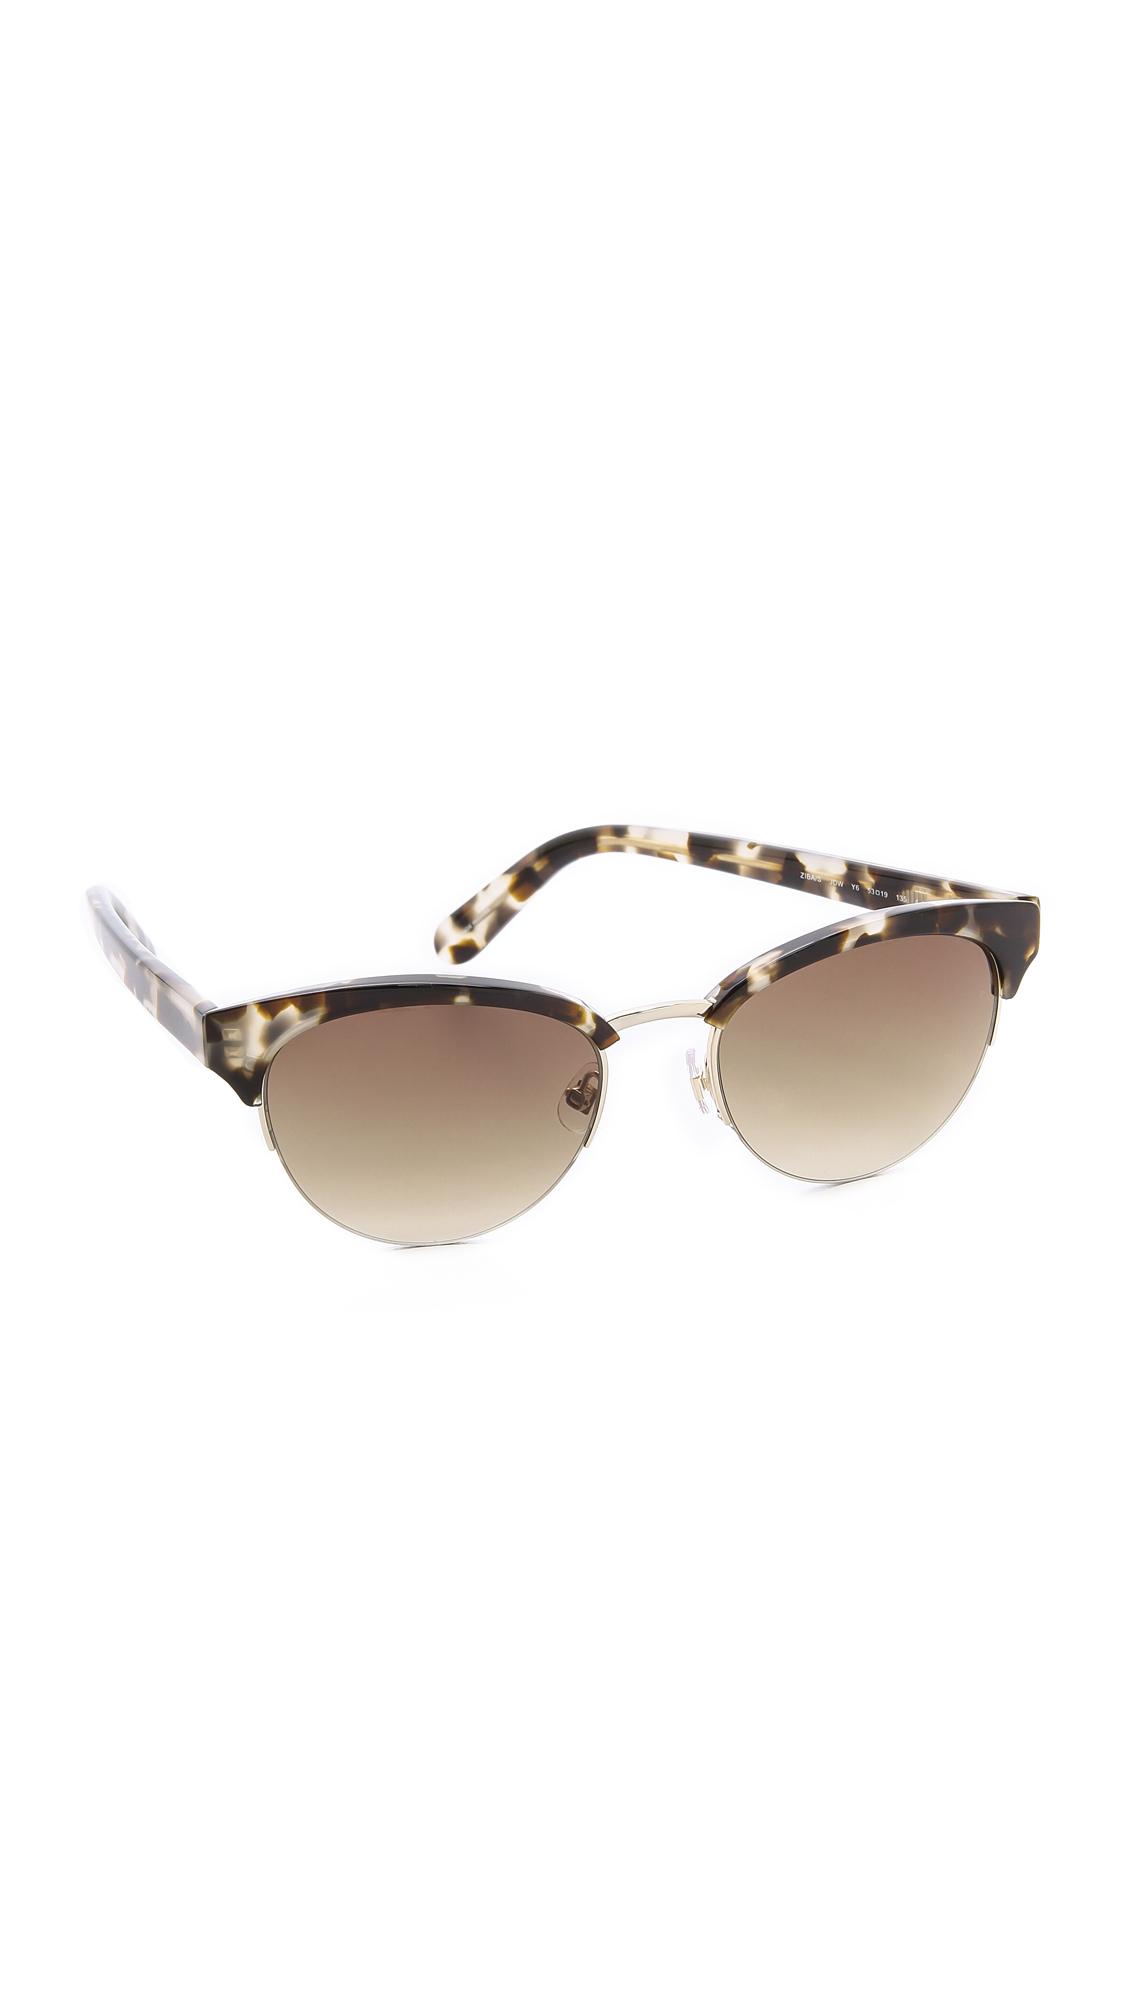 Kate Spade Zibas Sunglasses